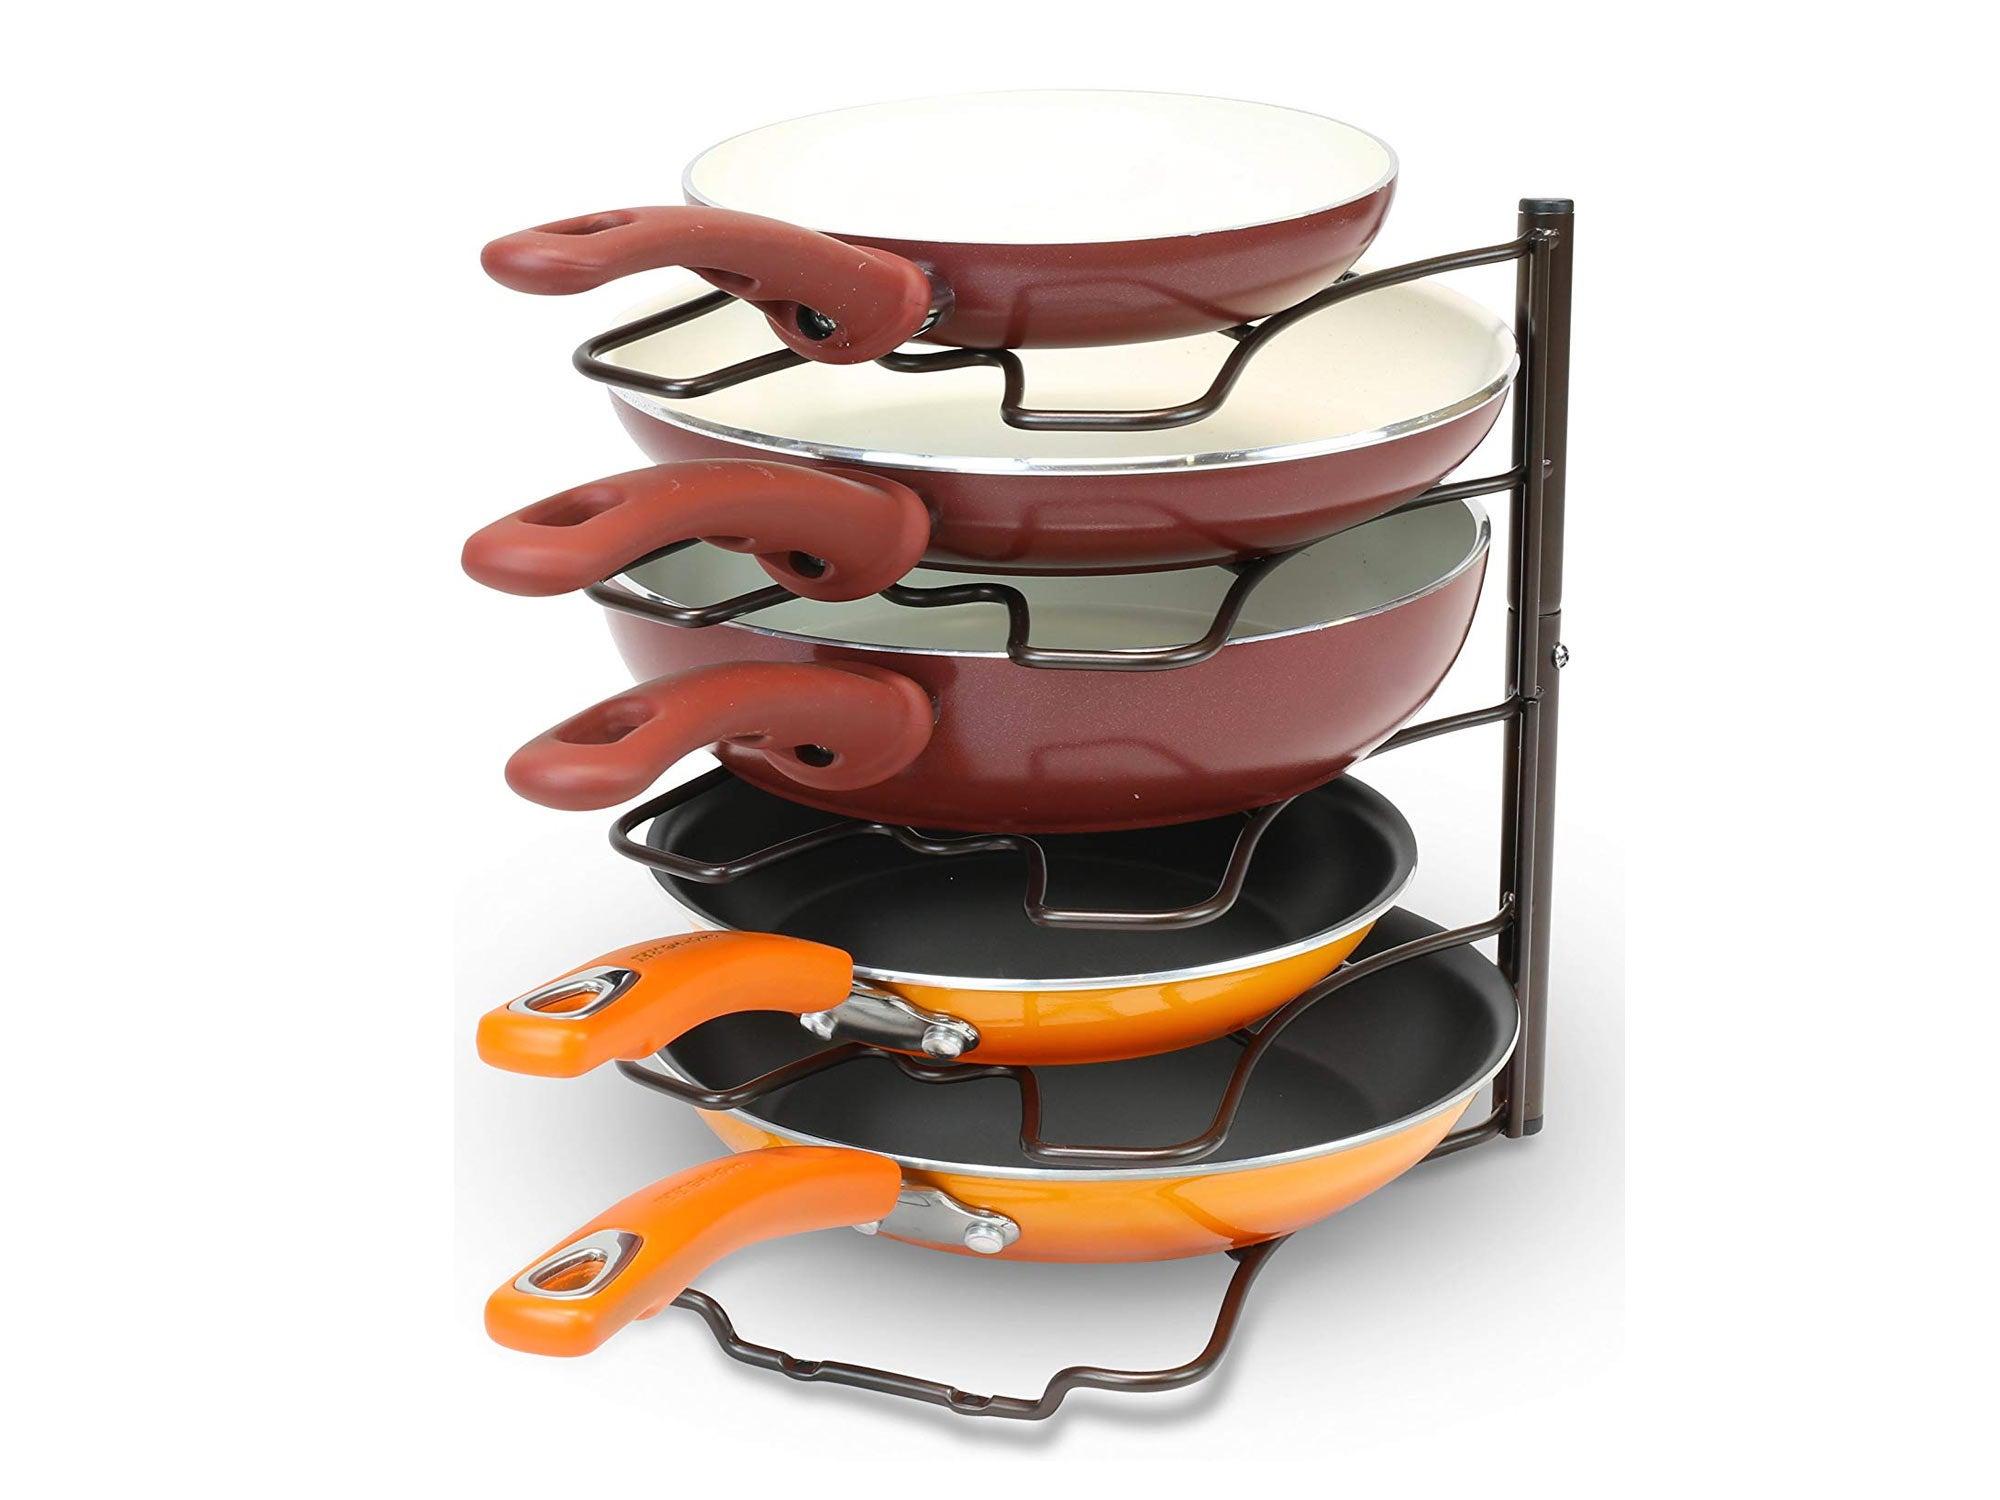 DecoBros Kitchen Counter and Cabinet Pan Organizer Shelf Rack